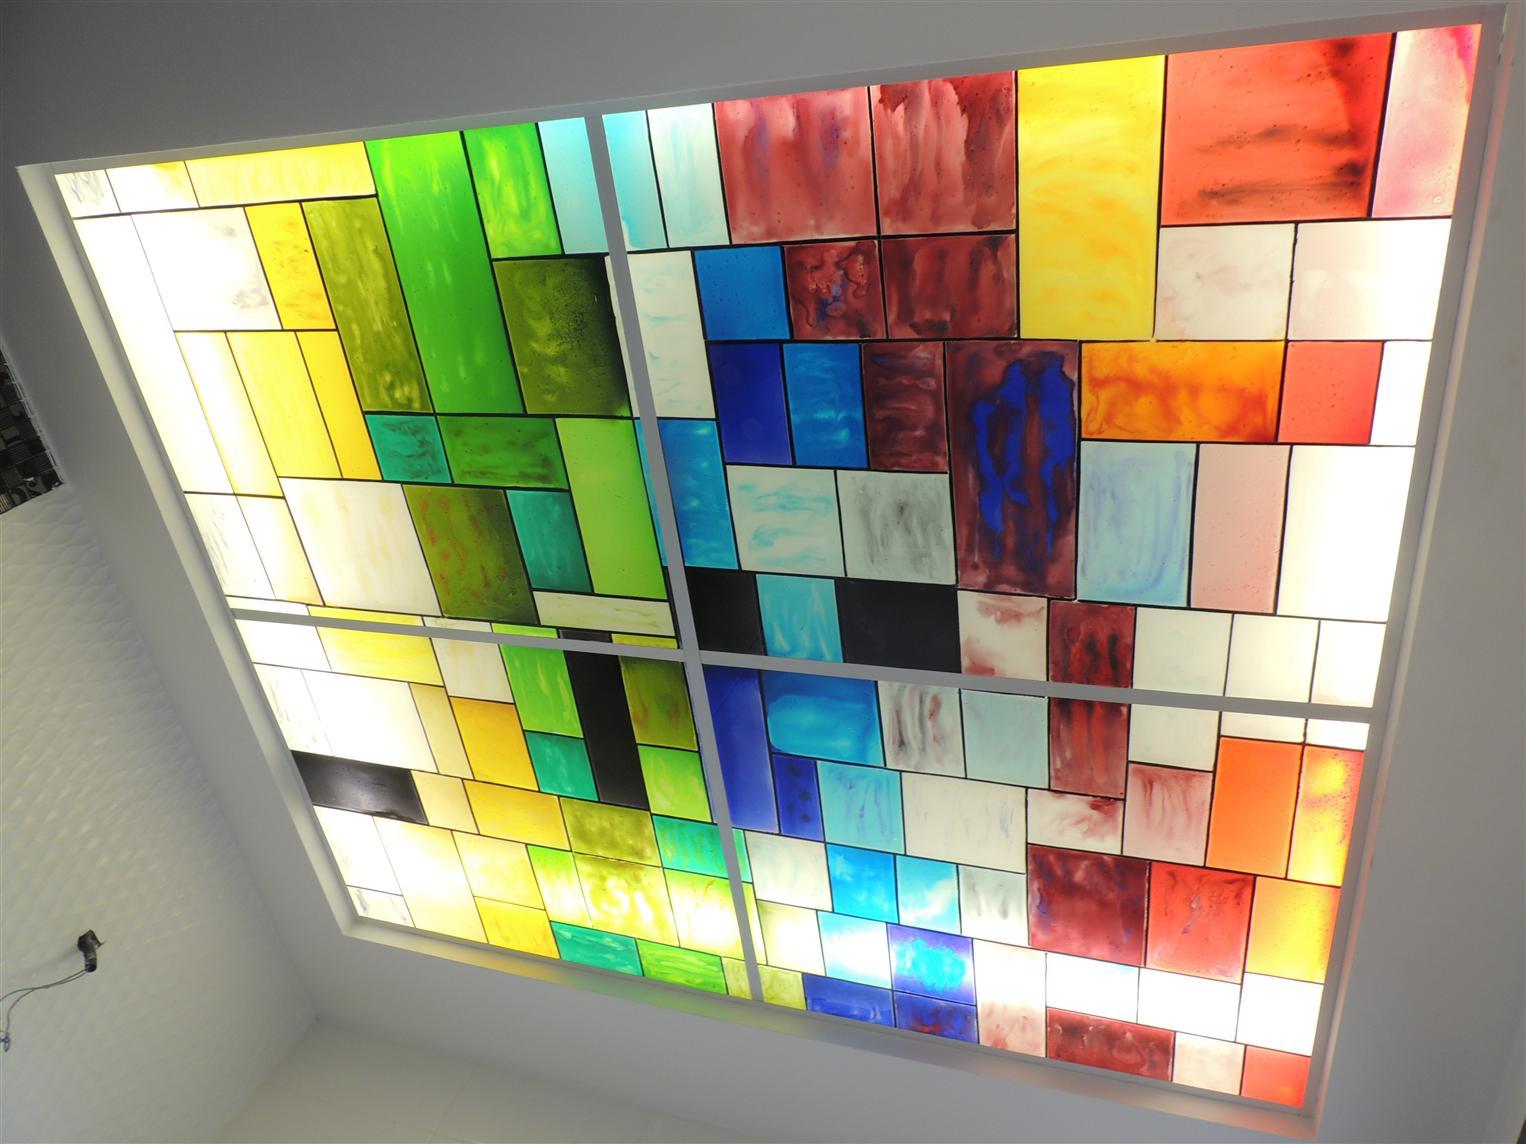 ahmet-bey-vilasi201592117327589.jpg izmir vitray çalışması